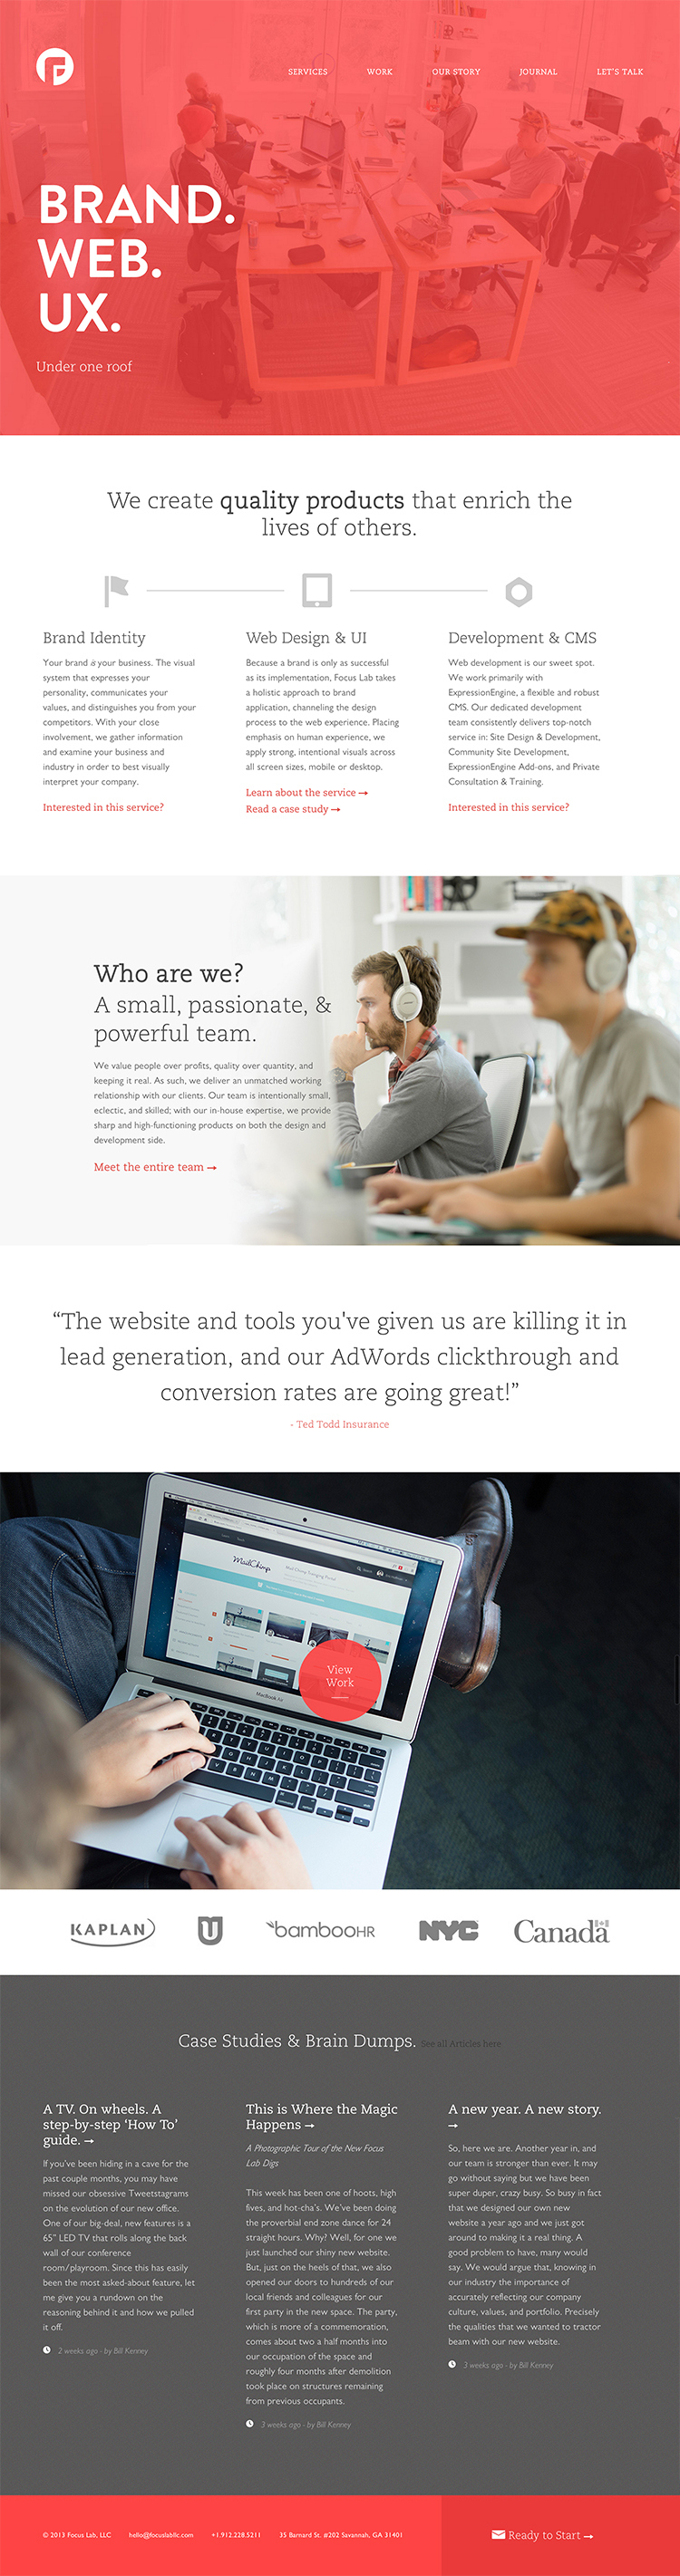 Focus Labs Http Www Fltdsgn Com Web Development Design Mobile Web Design Web Design